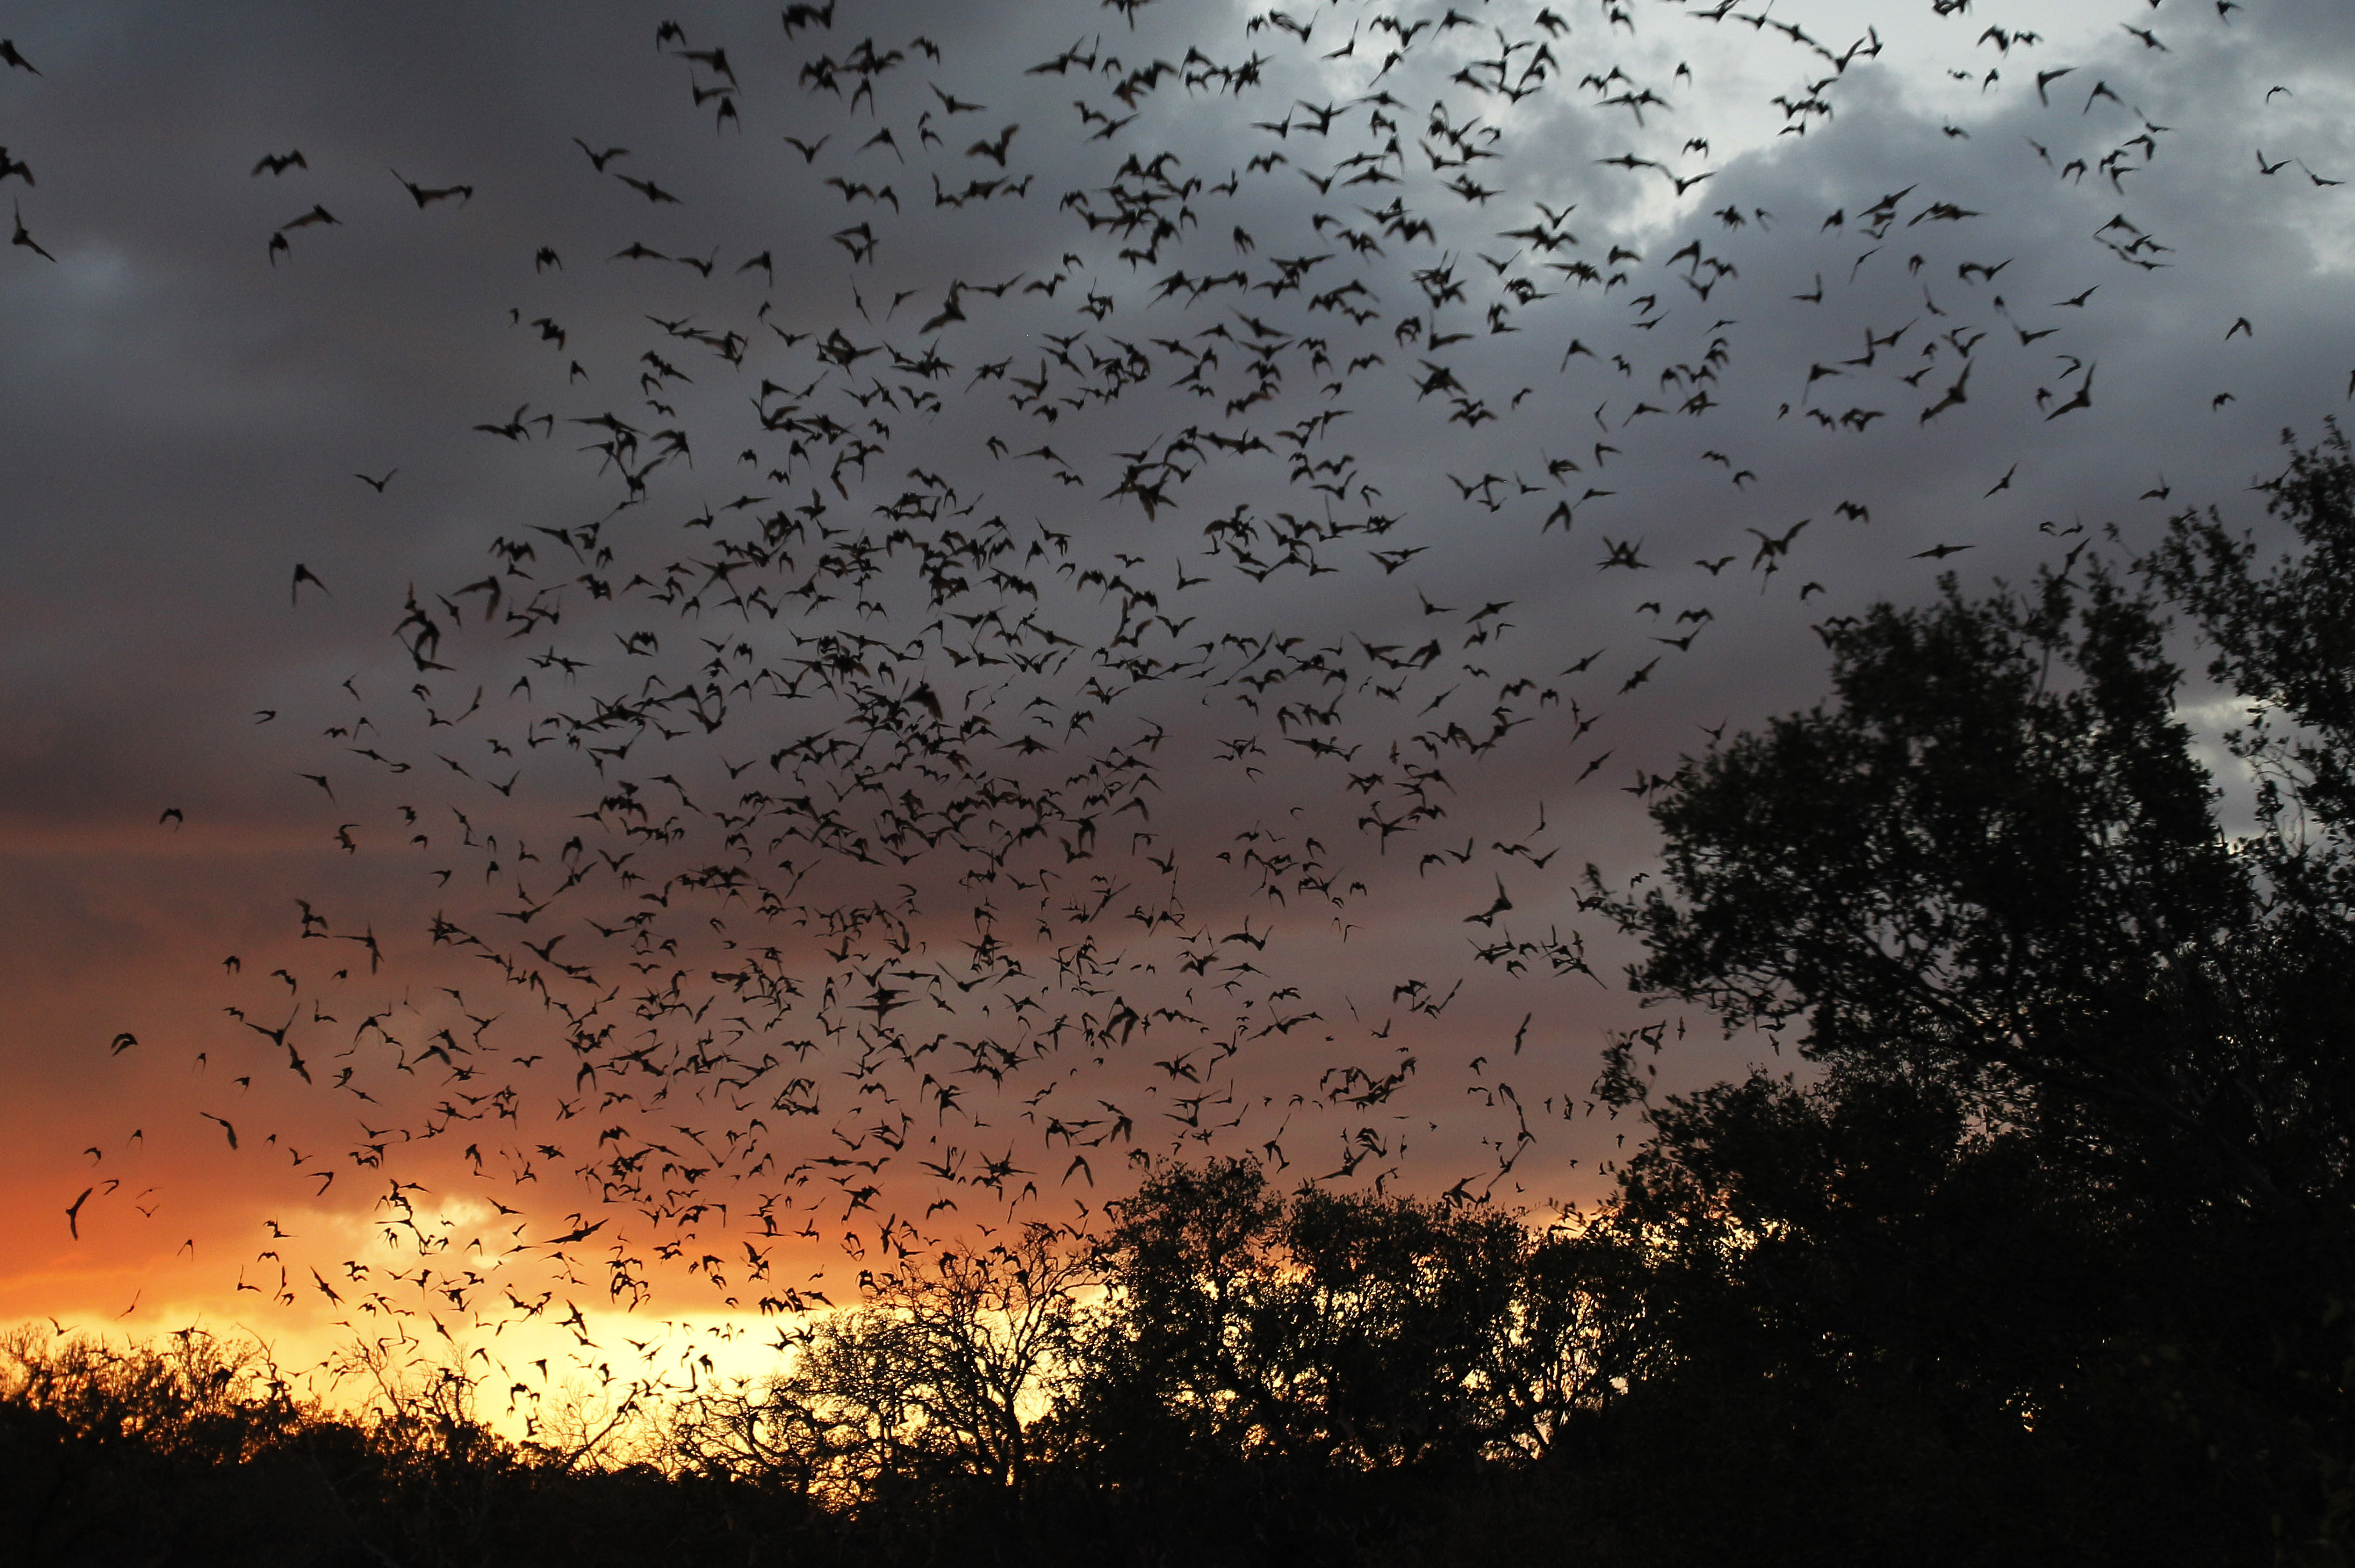 Massive Bat Cave Stirs Texas-Size Debate Over Development